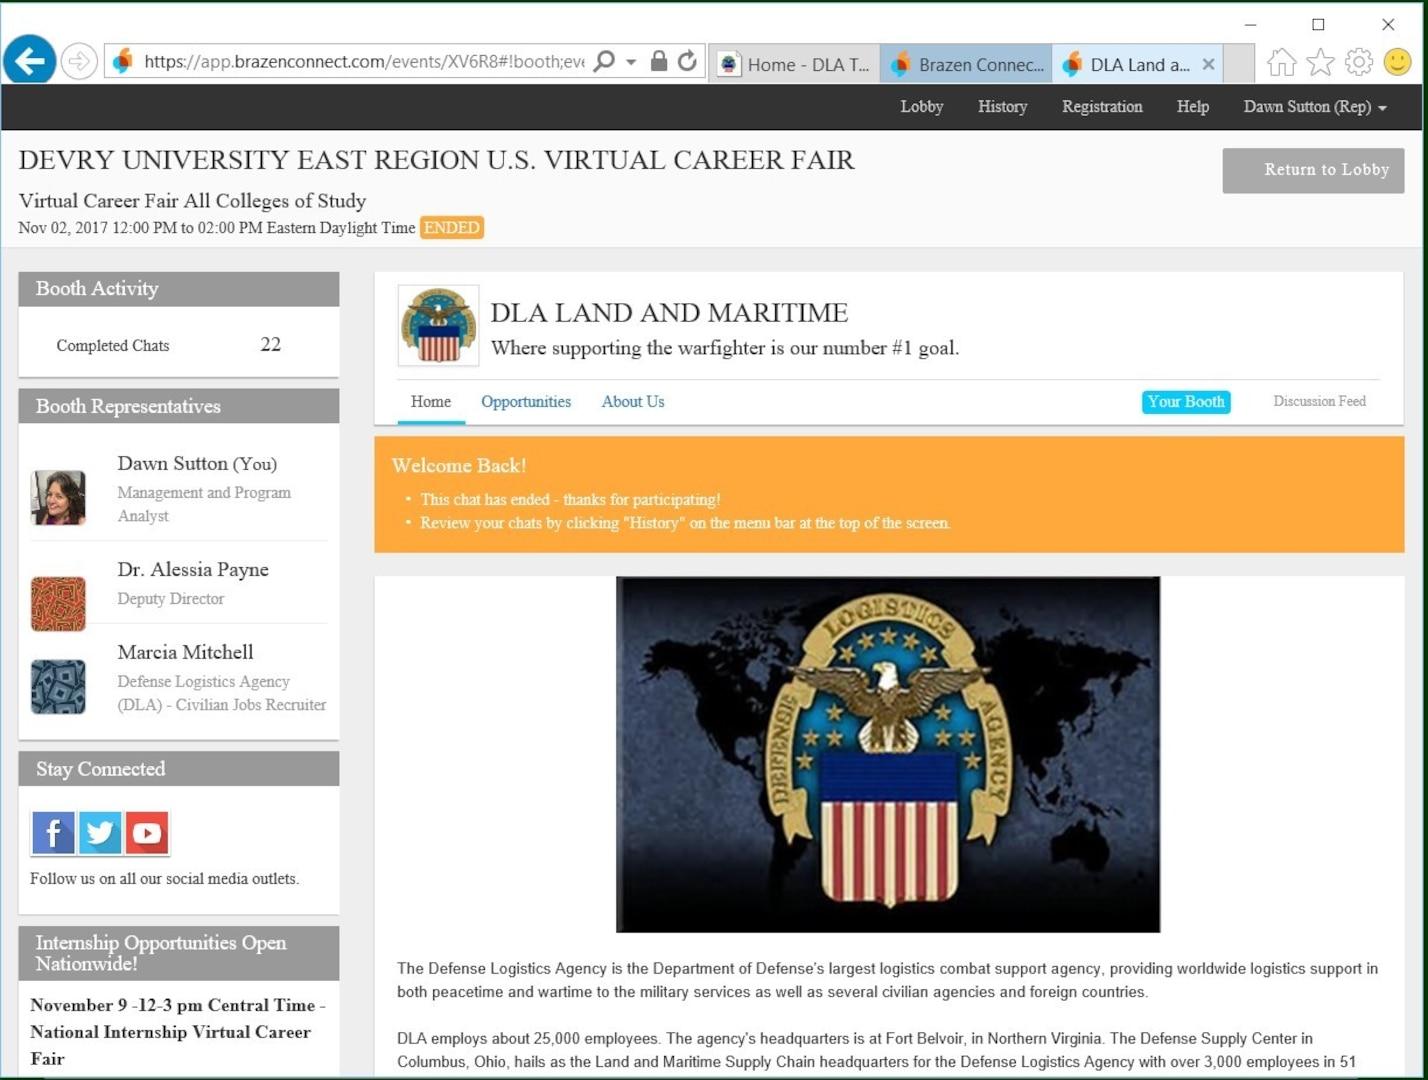 DeVry Virtual Career Fair booth chat screen.